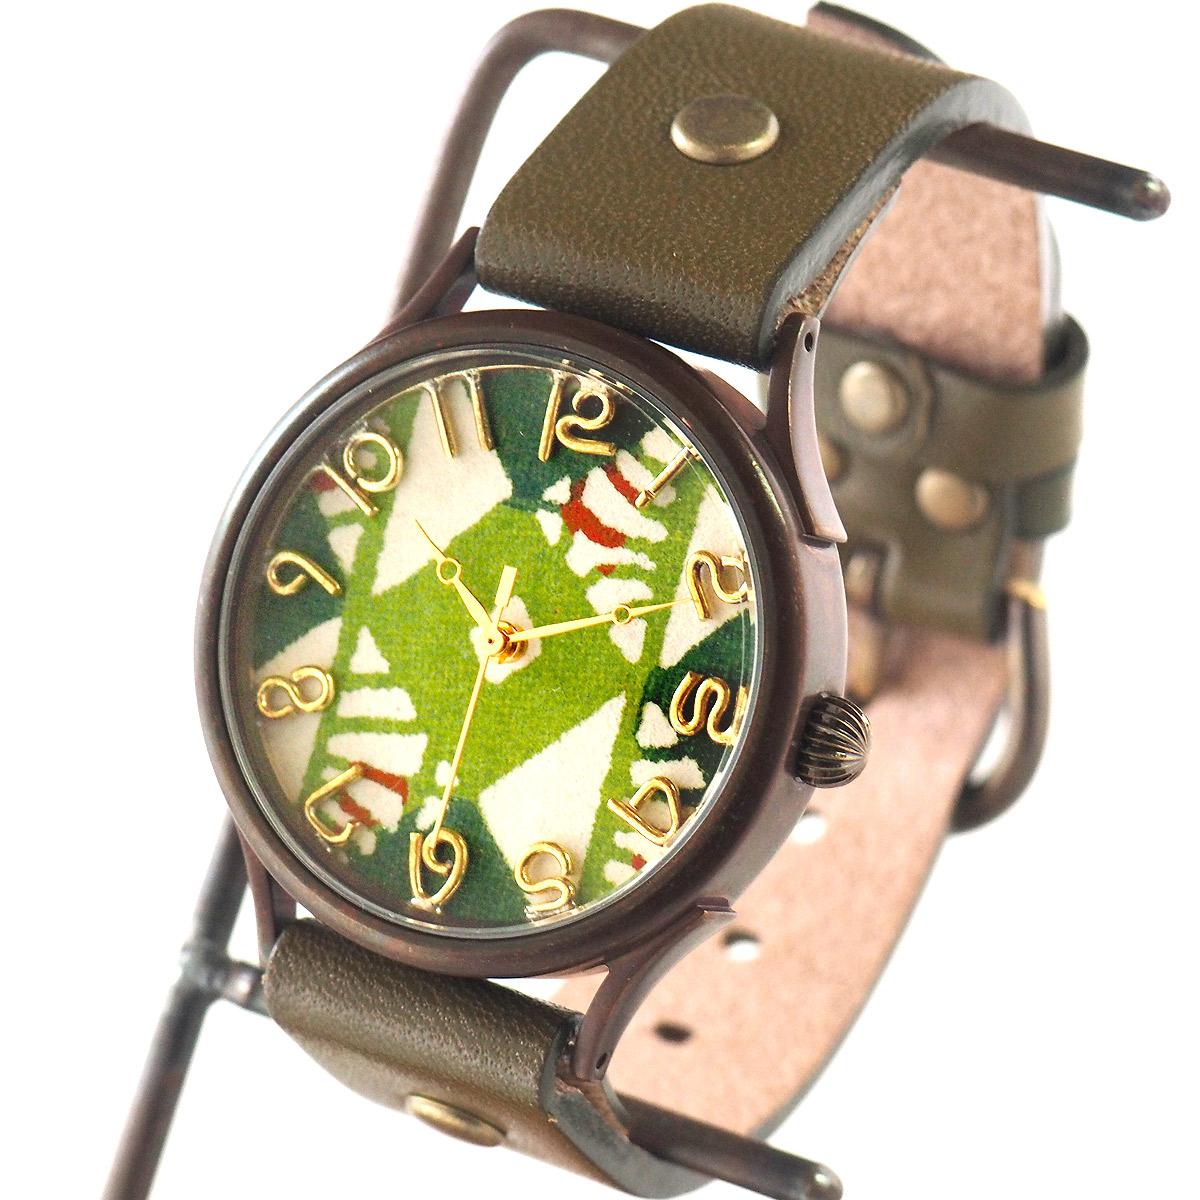 "vie(ヴィー) 手作り腕時計 ""和tch"" 和紙文字盤 和時計 菱緑 グリーン Lサイズ [MJ-004L-GR]"